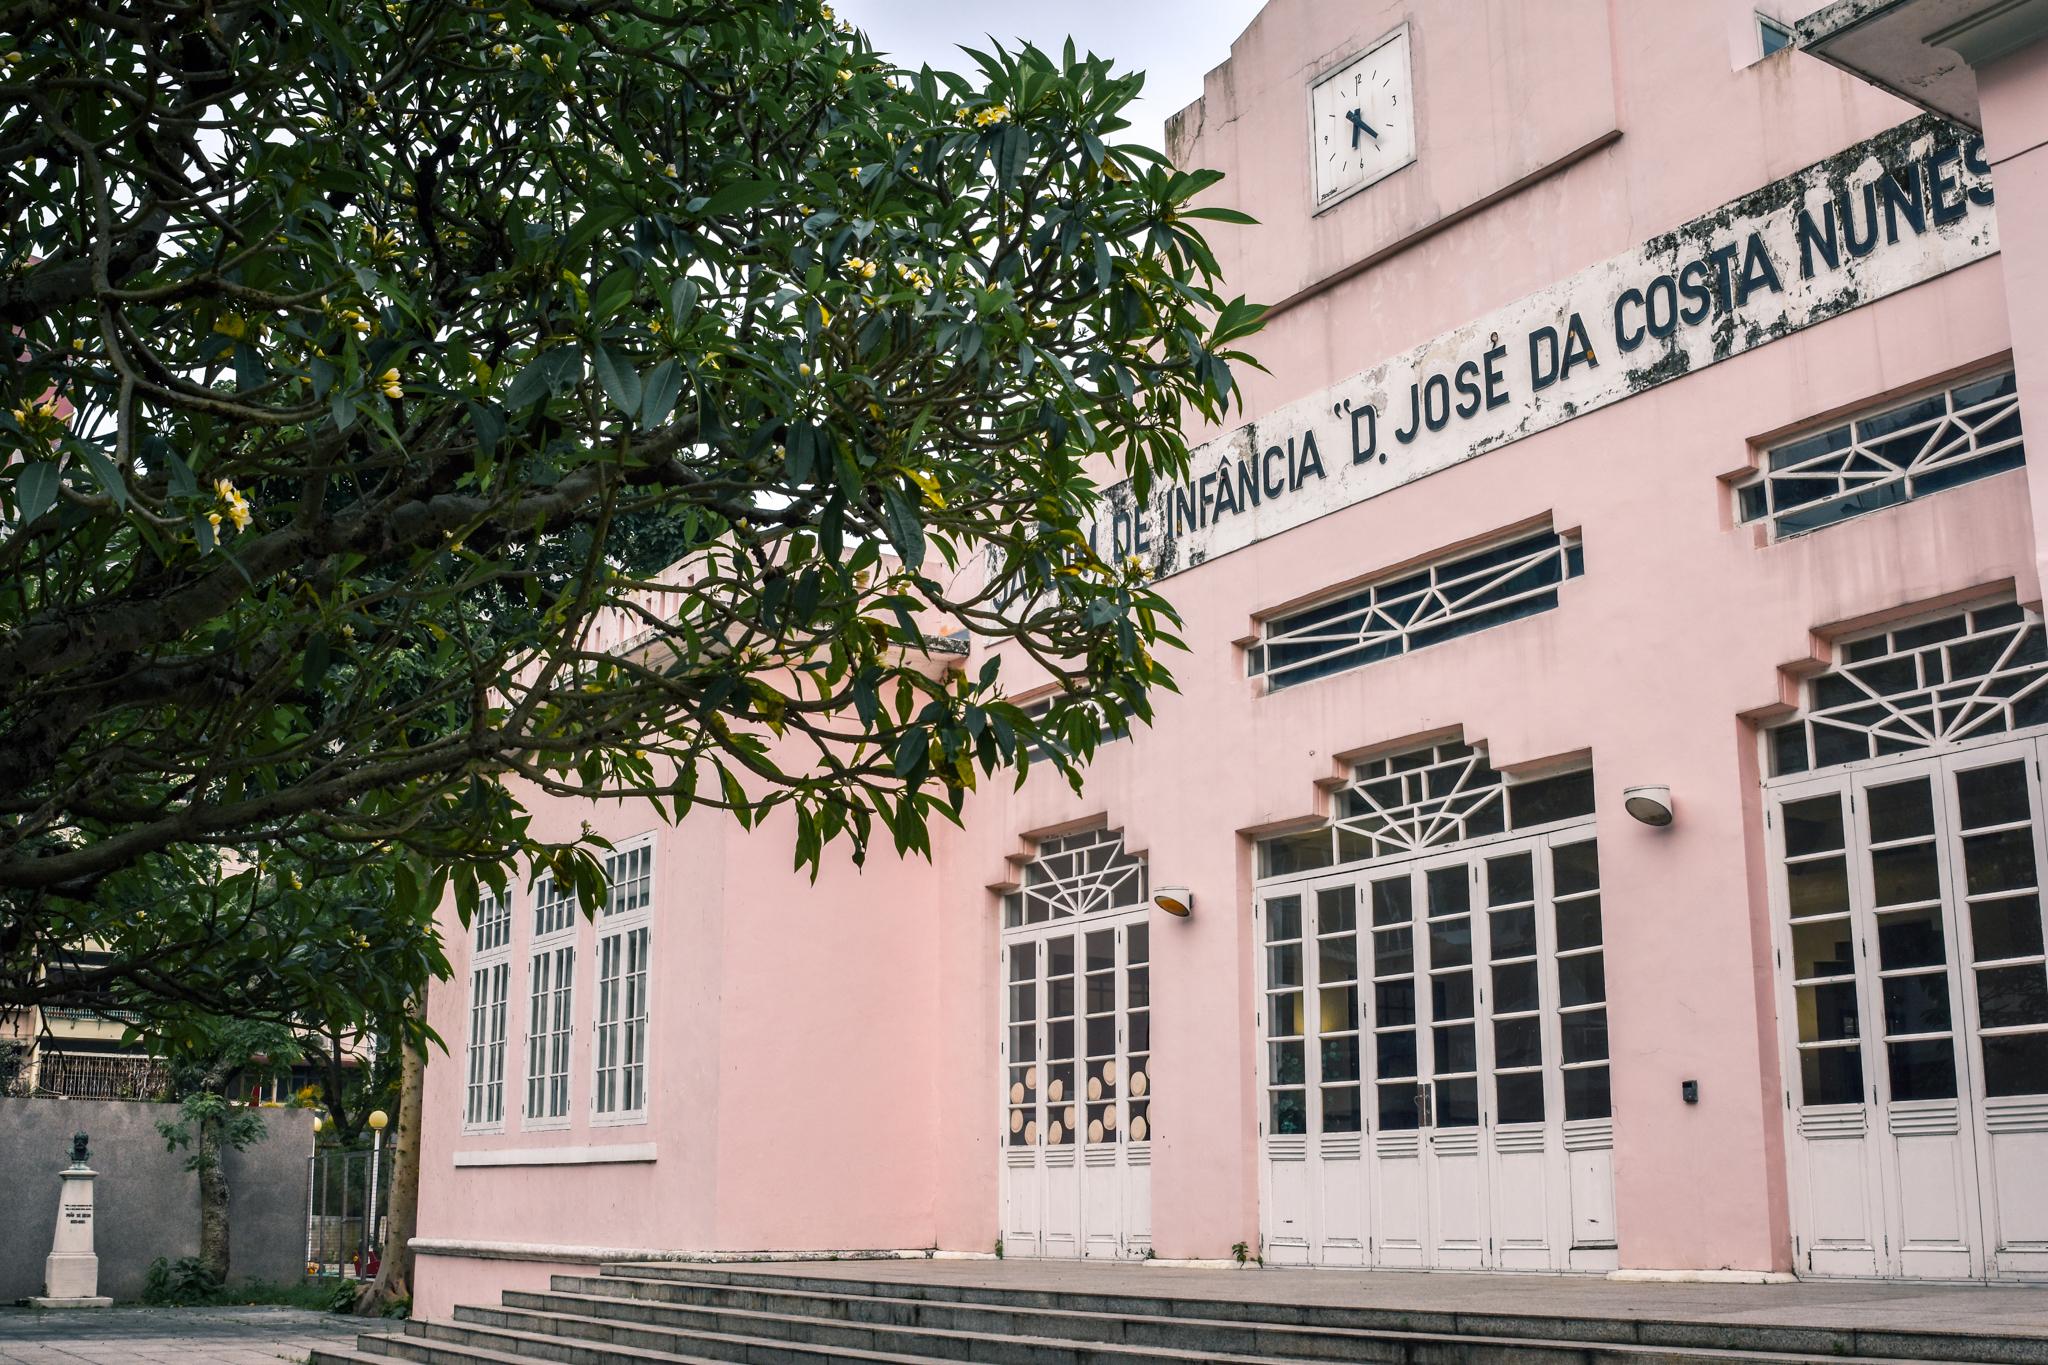 Costa Nunes | Falta de provas iliba suspeito de abusos sexuais